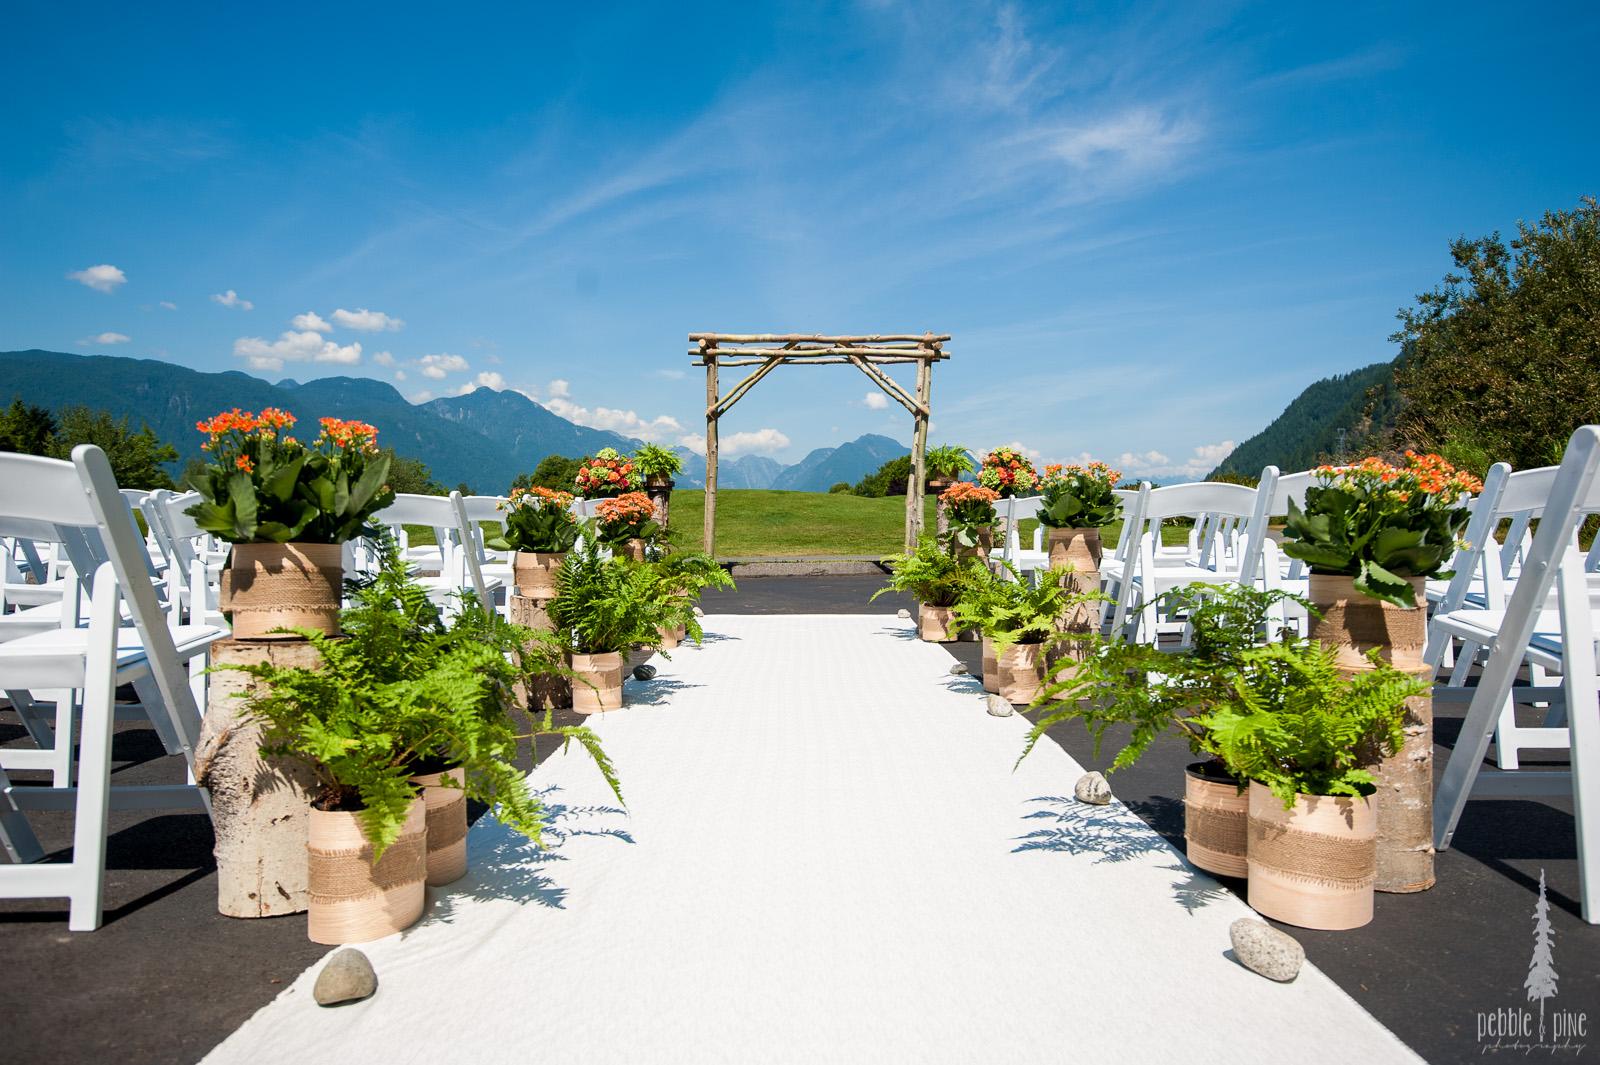 vancouver-island-wedding-photographers-golden-eagle-golf-course-wedding-mountaintop-wedding-03.jpg